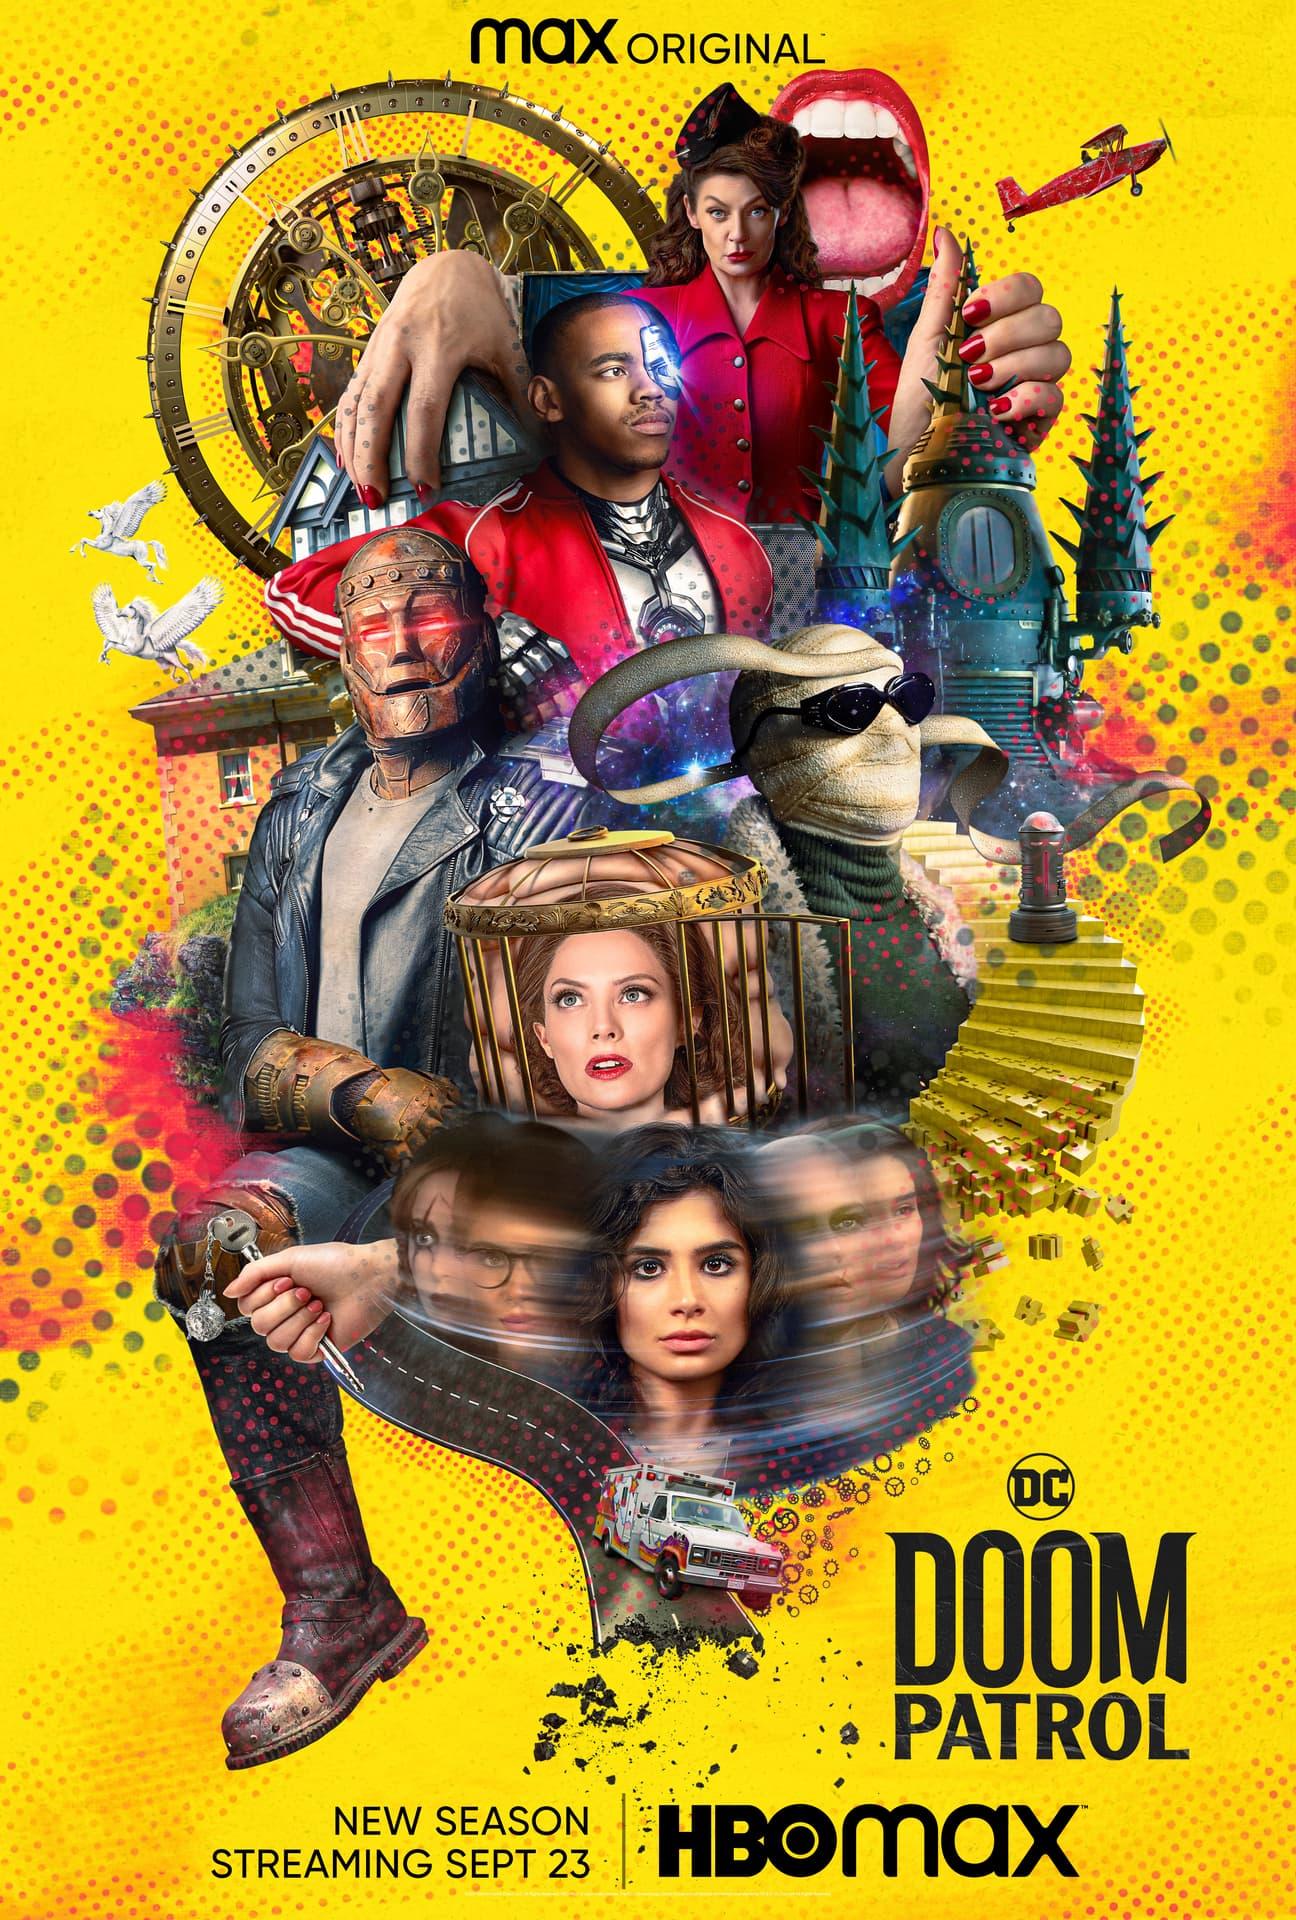 Doom Patrol Season 3 Review: Craziest Season Yet!